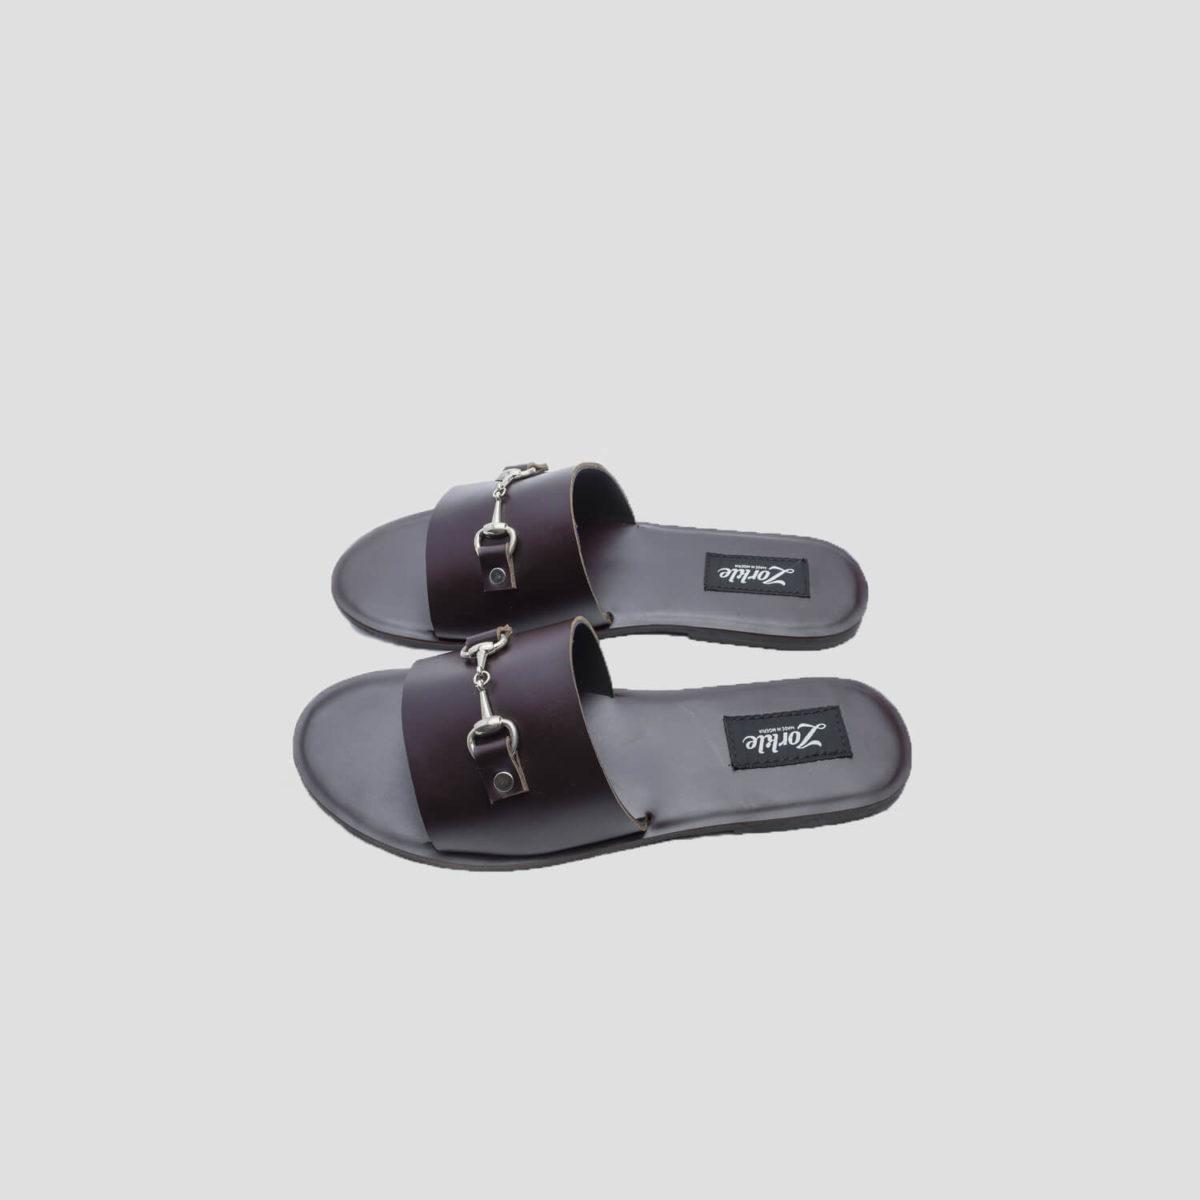 Nero Slippers Coffee Leather Horse-bit zorkle shoes lagos nigeria